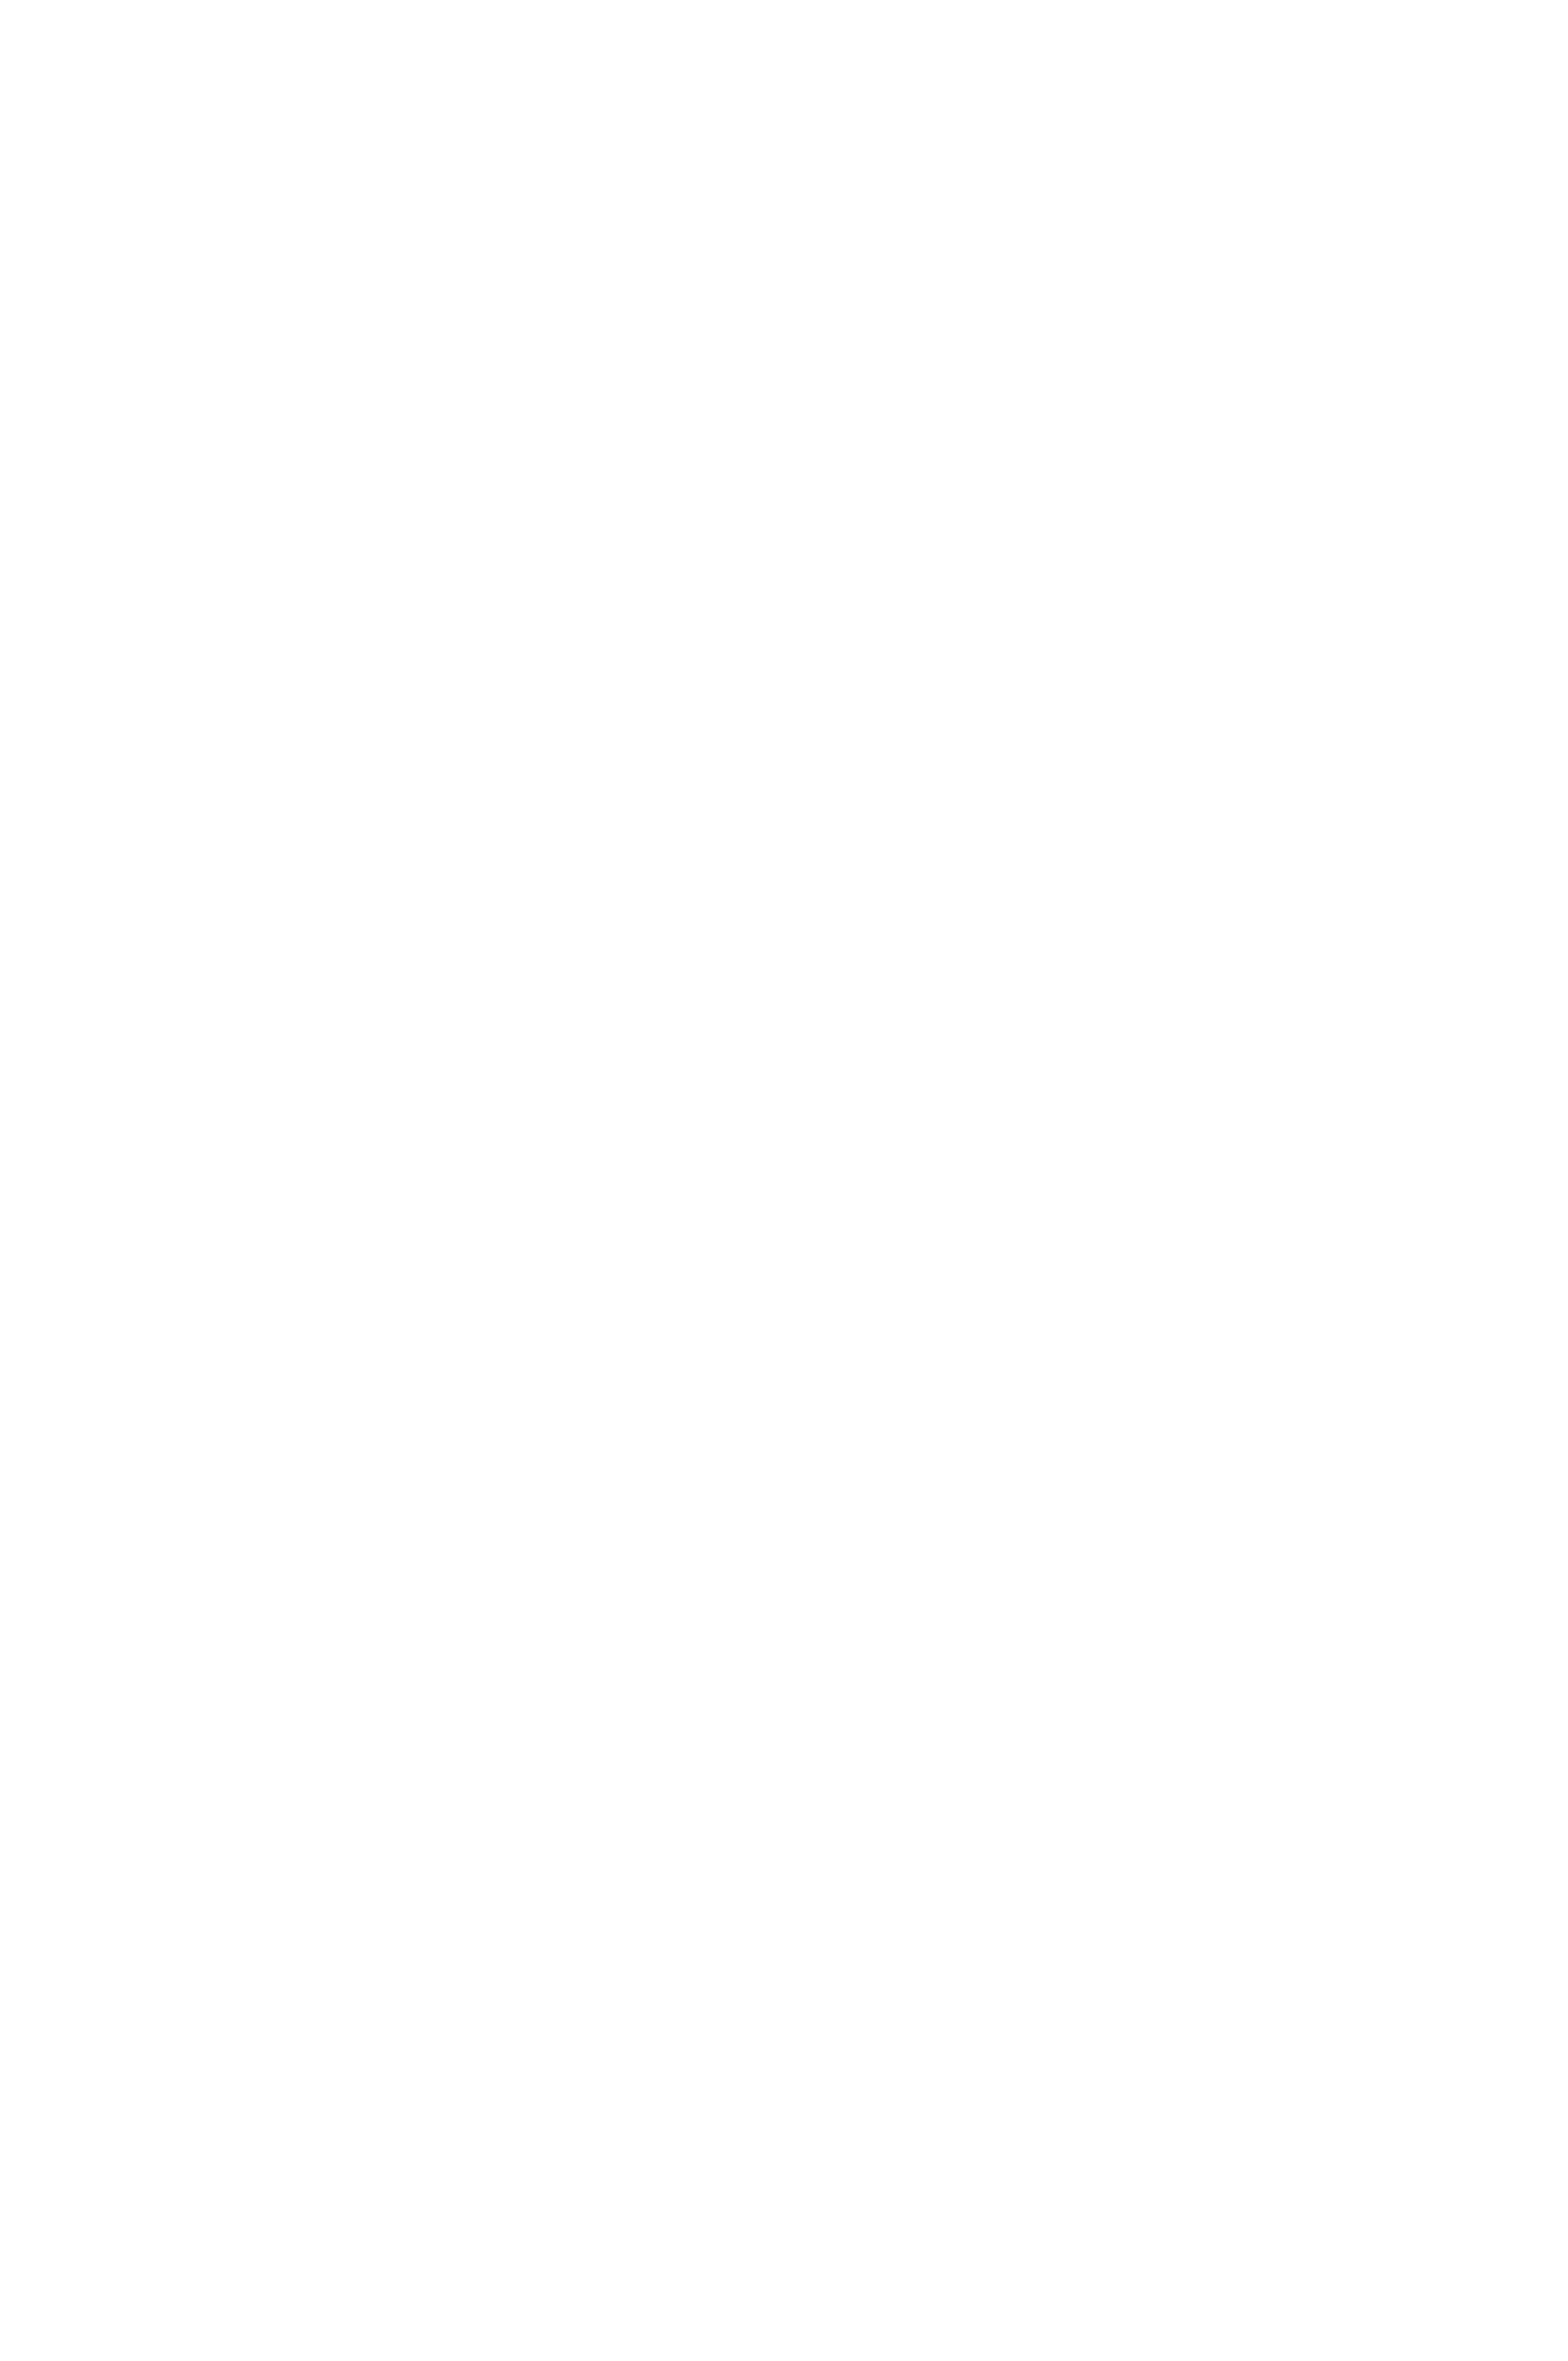 icone 10